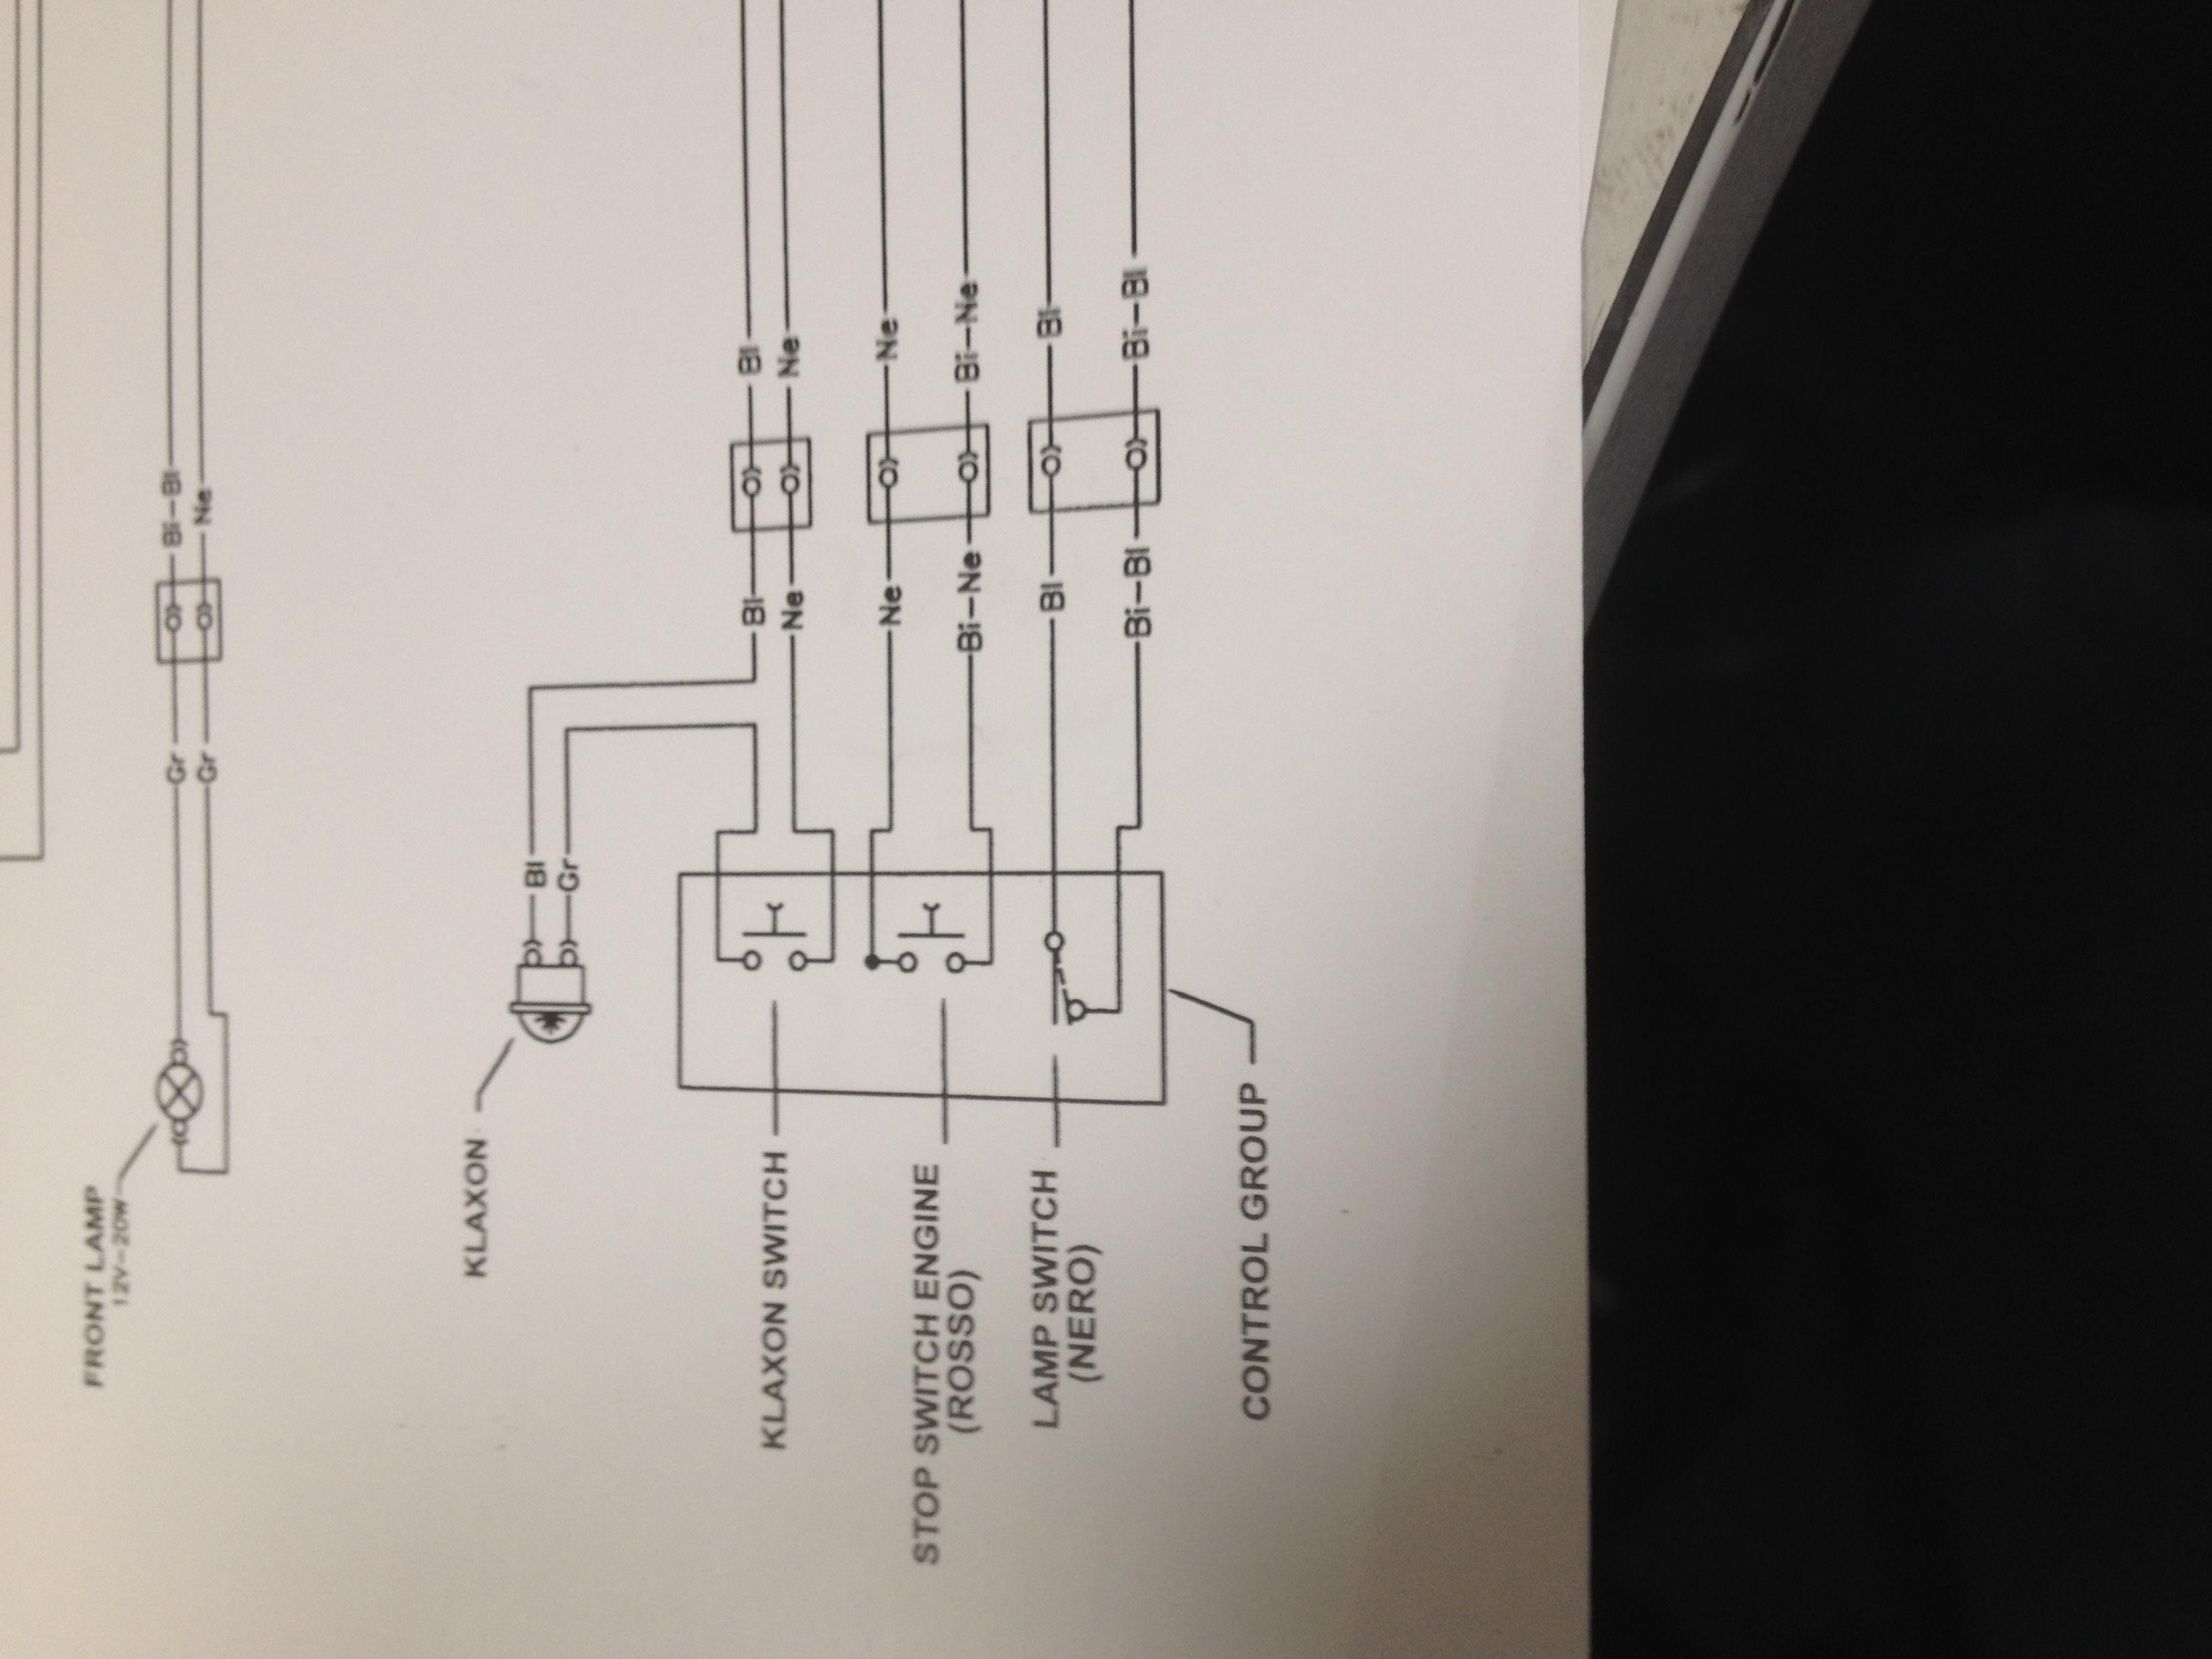 SF_9495] Can Am Ds 250 Wire Diagram Free Download Wiring Diagram SchematicWww Mohammedshrine Librar Wiring 101